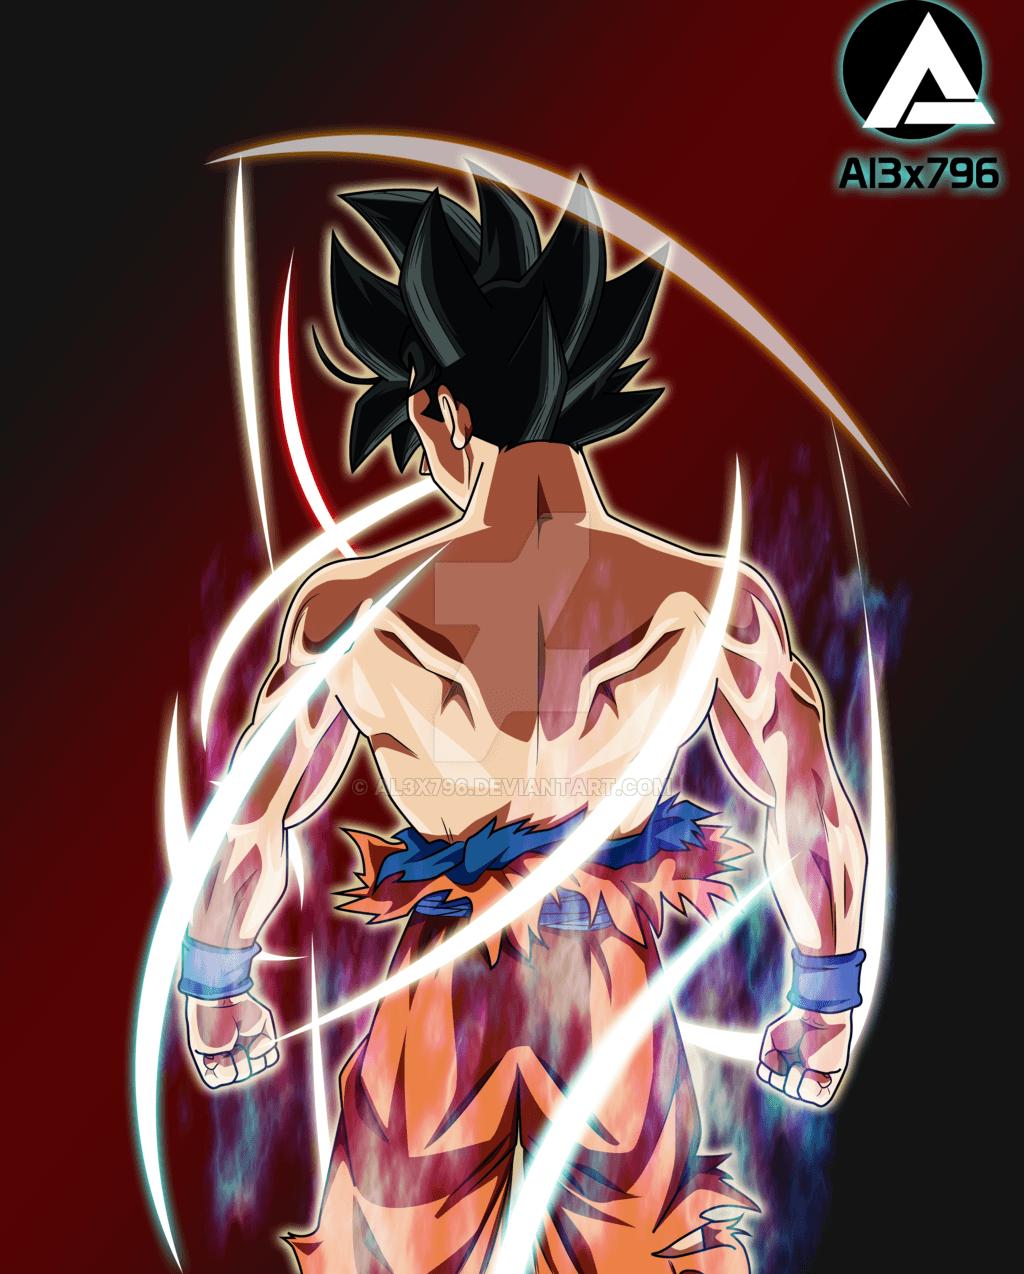 1080p Dragon Ball Z Goku Wallpaper